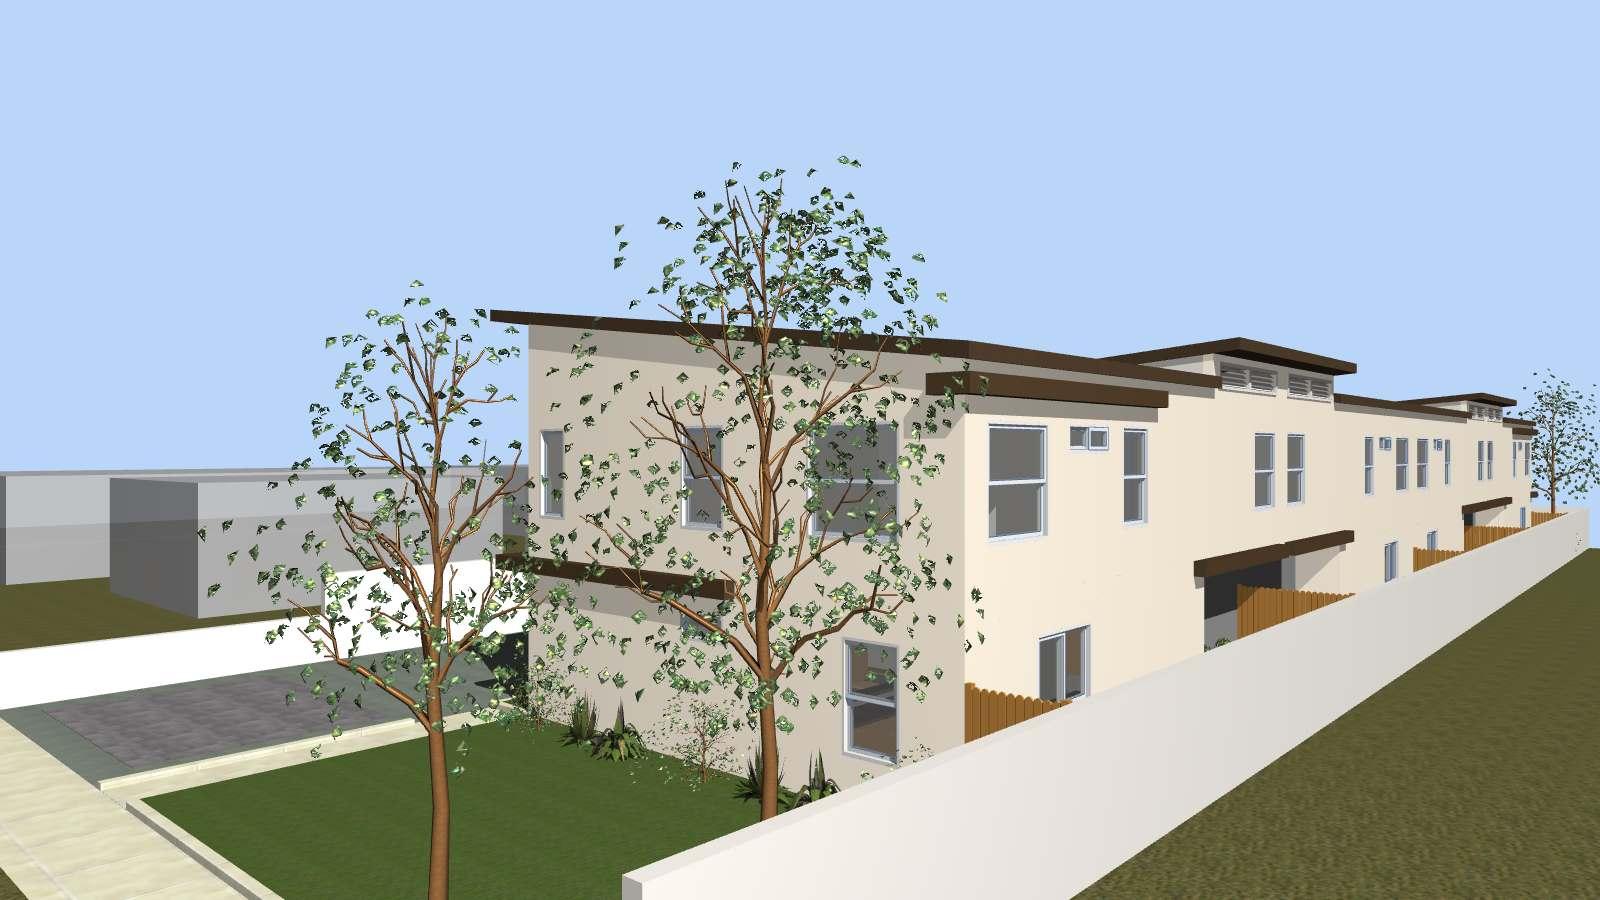 201310-Adelia- View 2 131007.jpg